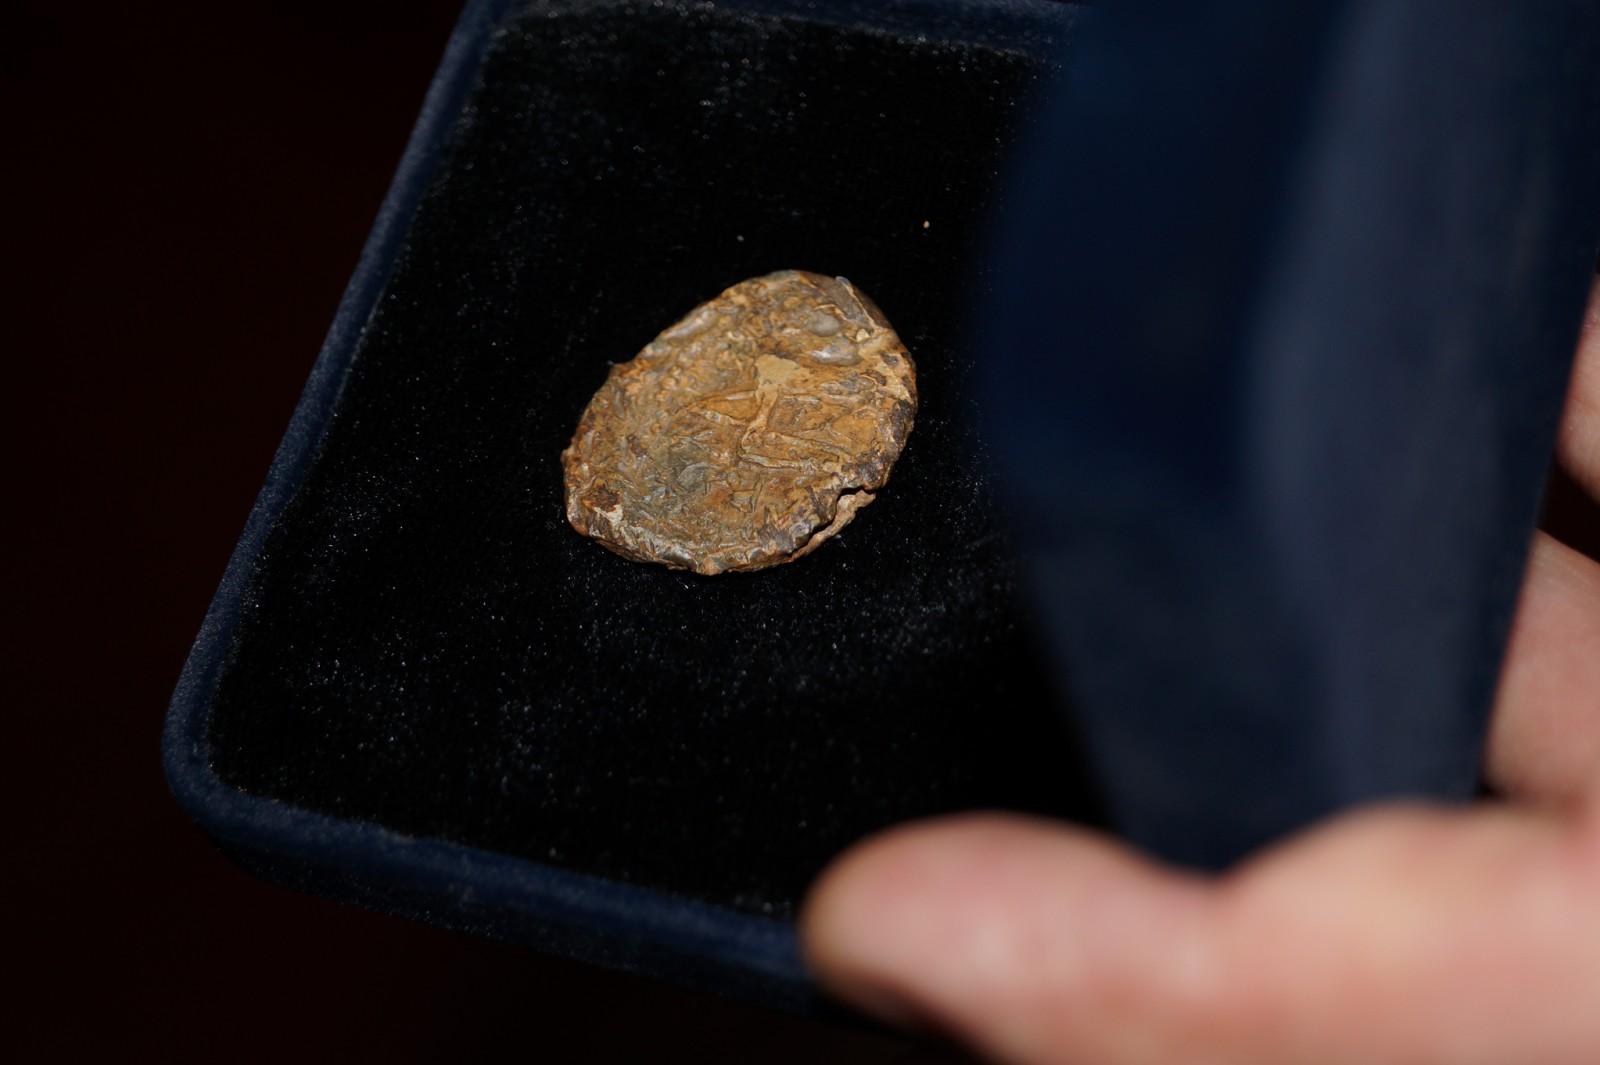 Броварчанам показали артефакт - печатку князя Святослава Хороброго -  - zobrazhennya viber 2020 02 26 14 38 26